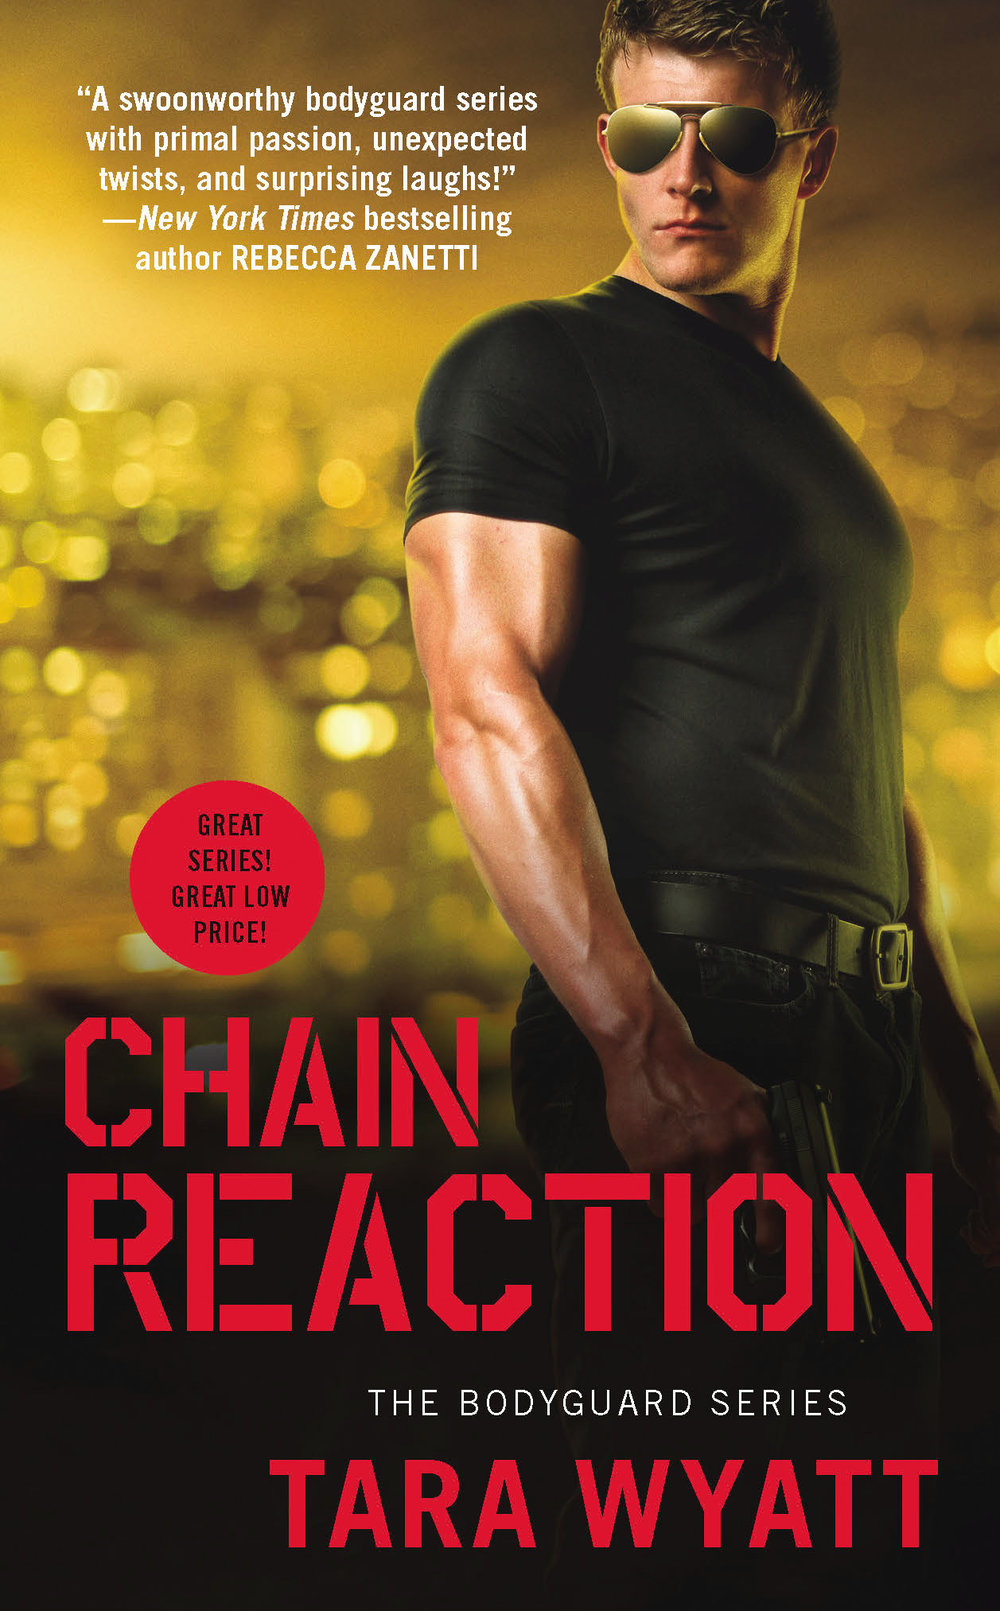 Chain Reaction by Tara Wyatt The Bodyguard Series Book 3 Romantic Suspense